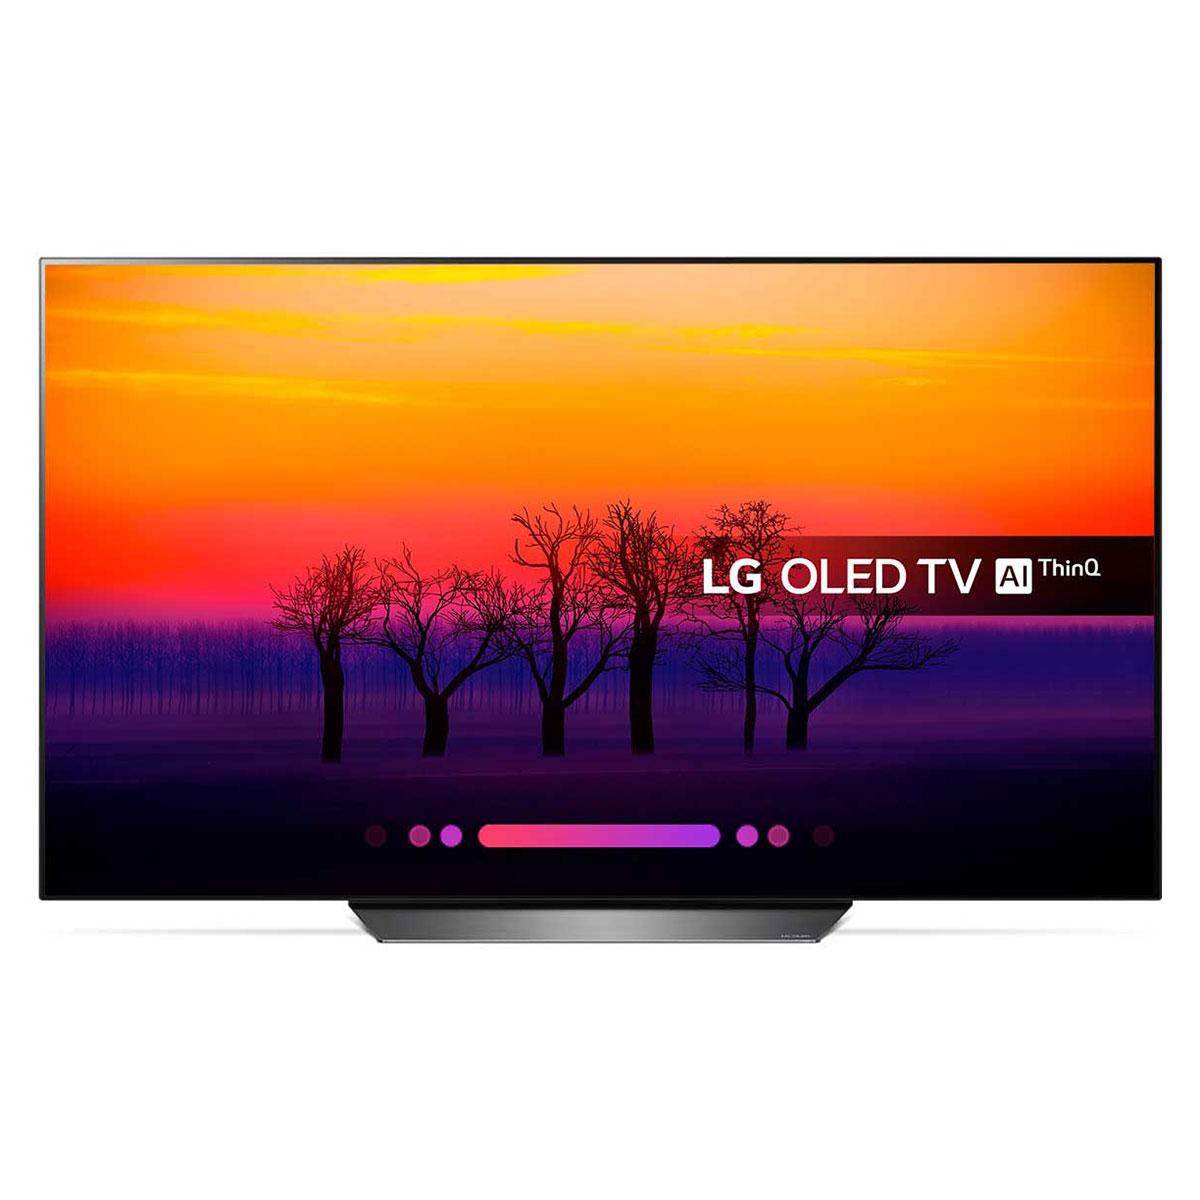 "TV LG OLED55B8 Téléviseur OLED 4K 55"" (140 cm) 16/9 - 3840 x 2160 pixels - Ultra HD 2160p - HDR - Wi-Fi - Bluetooth - Dolby Atmos"